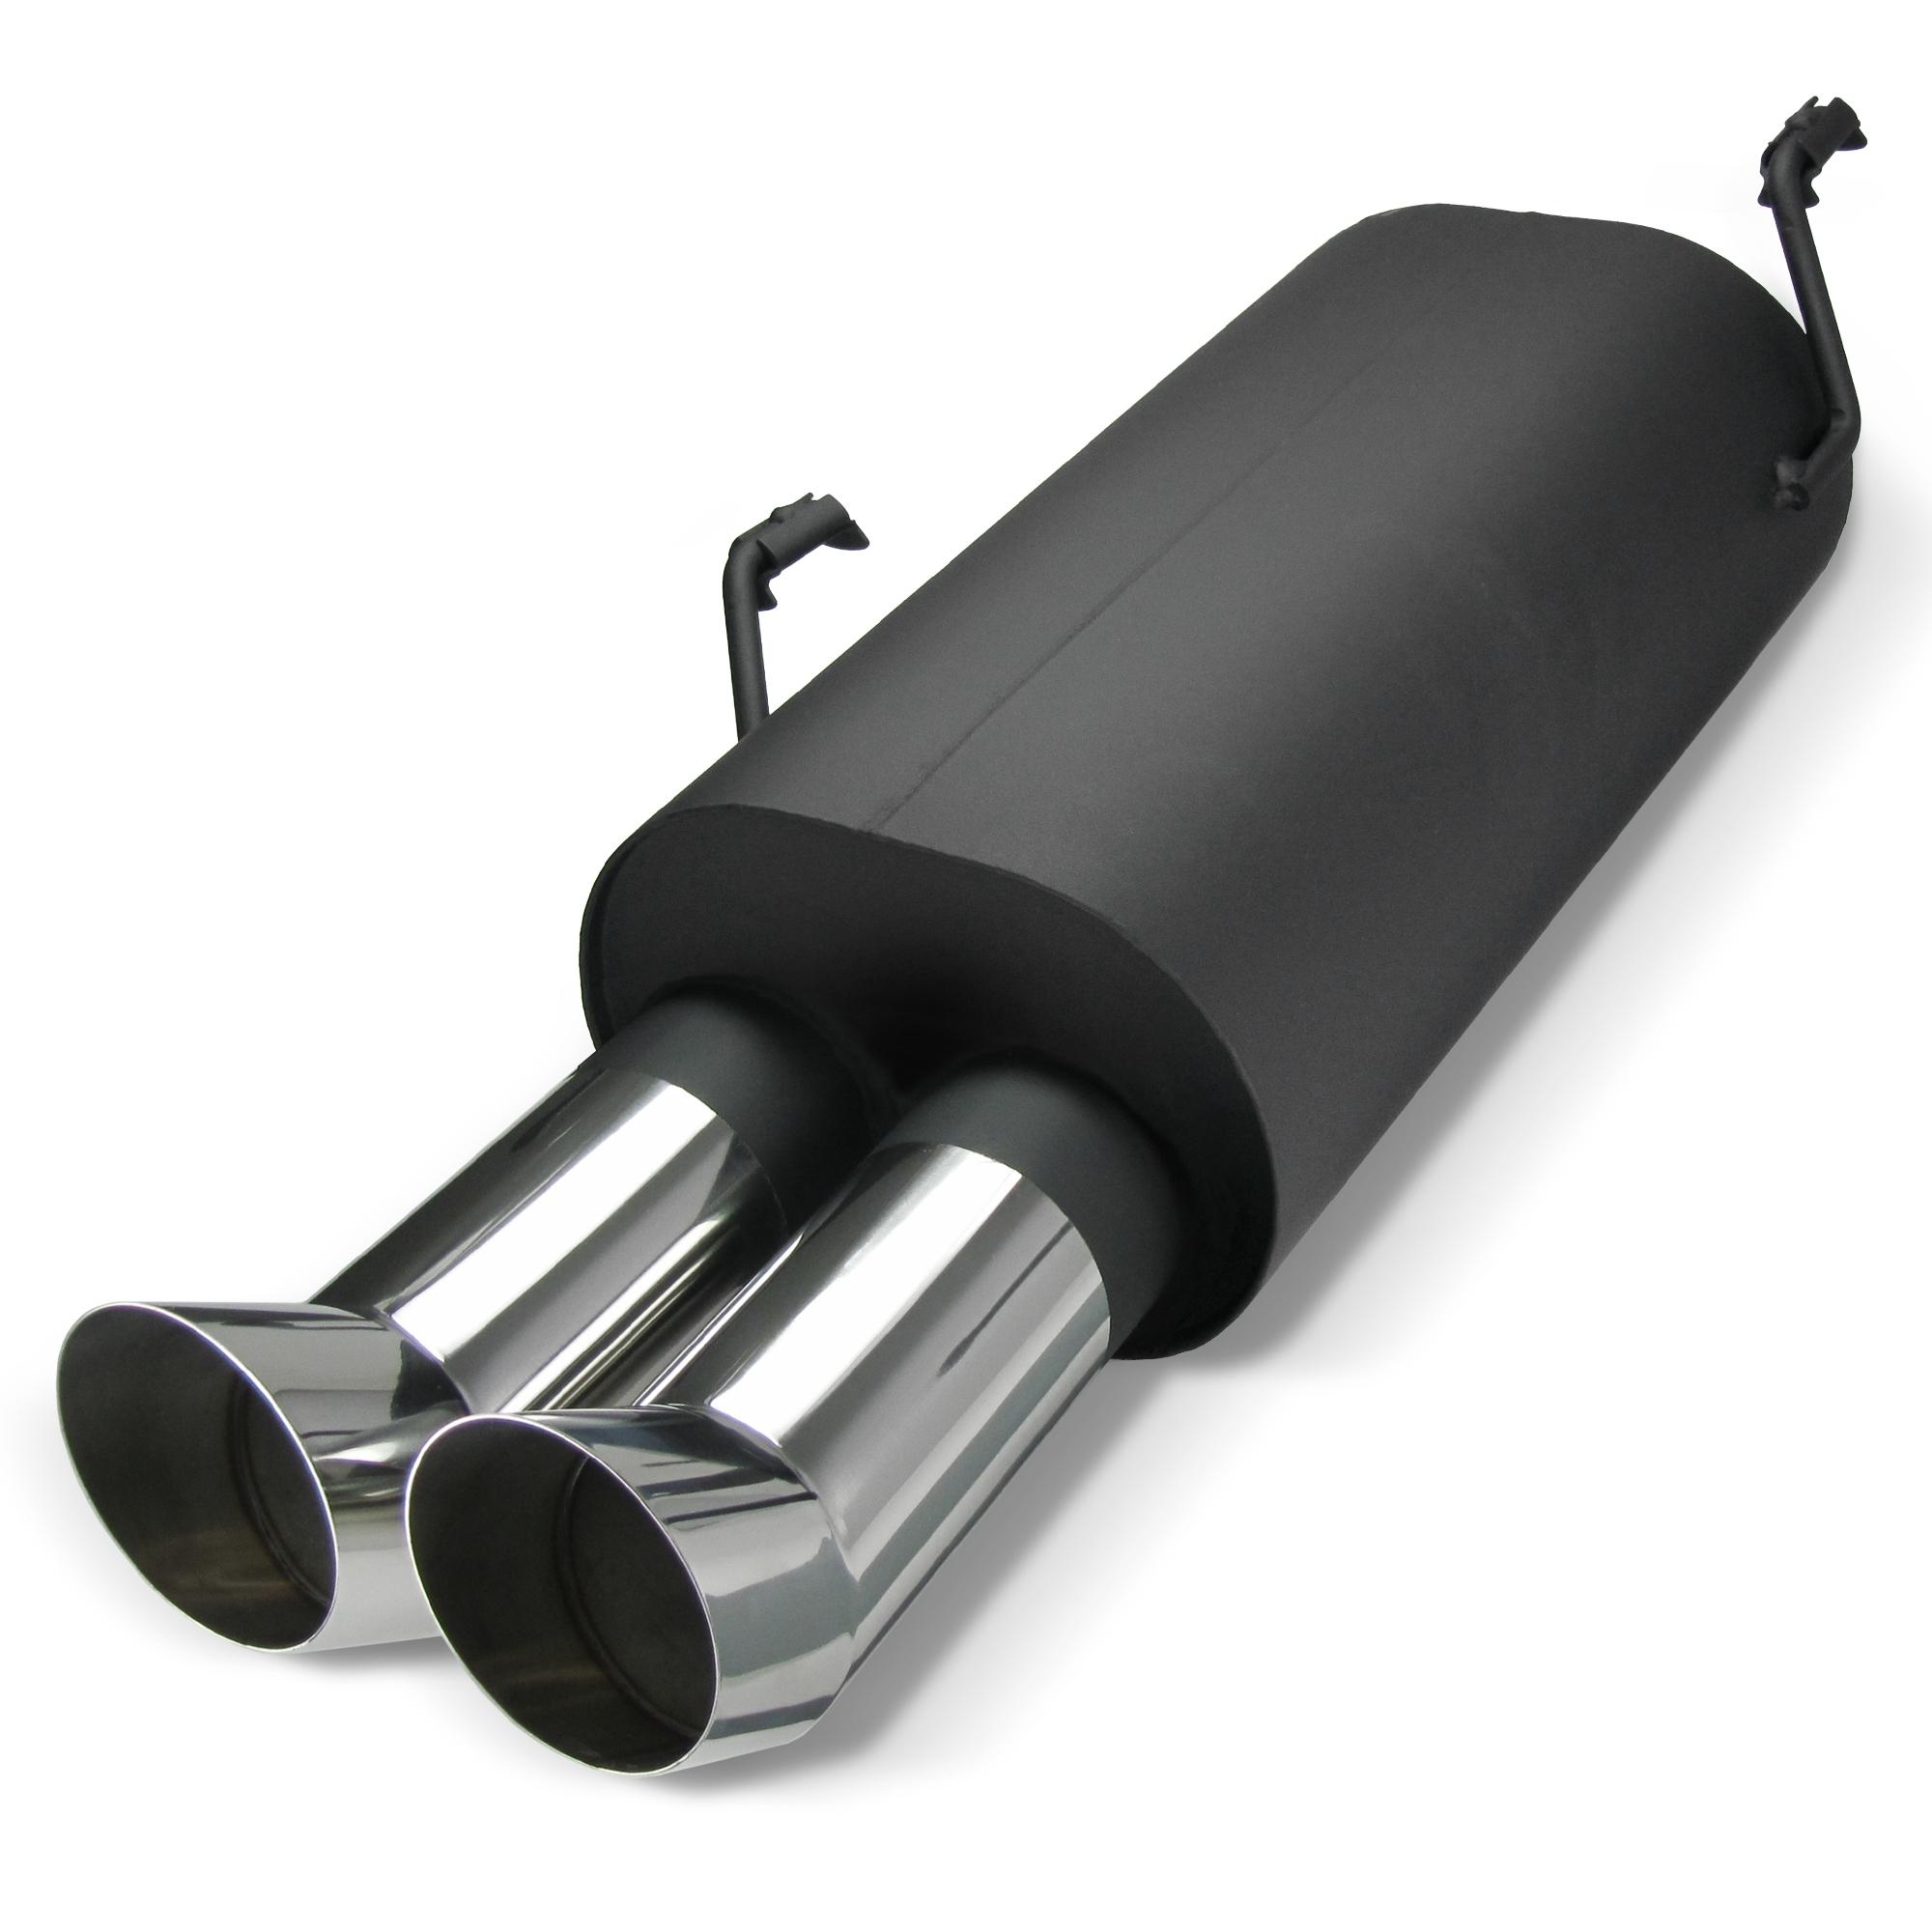 JOM 89036 Stahl-Endschalld/ämpfer mit 2X 76mm DTM-Look Endrohren